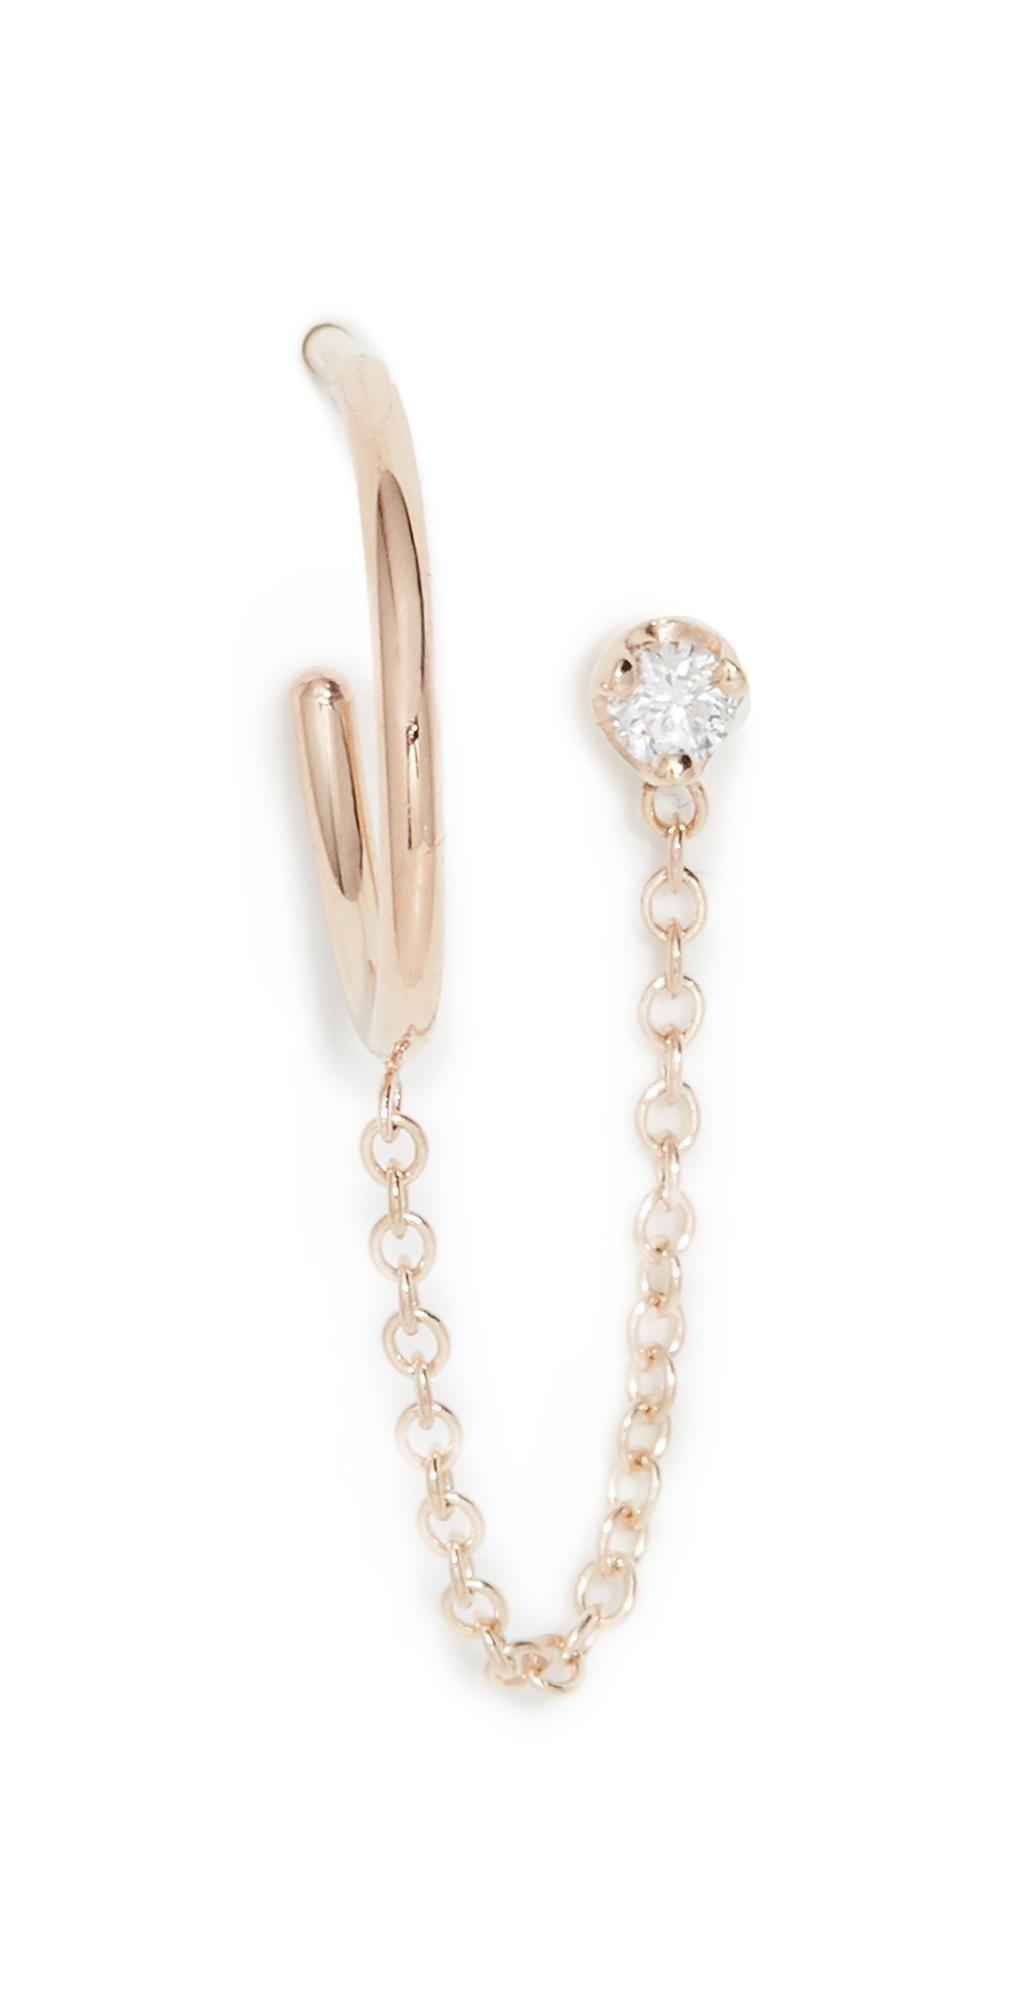 Zoë Chicco Prong Diamond Earring In Gold